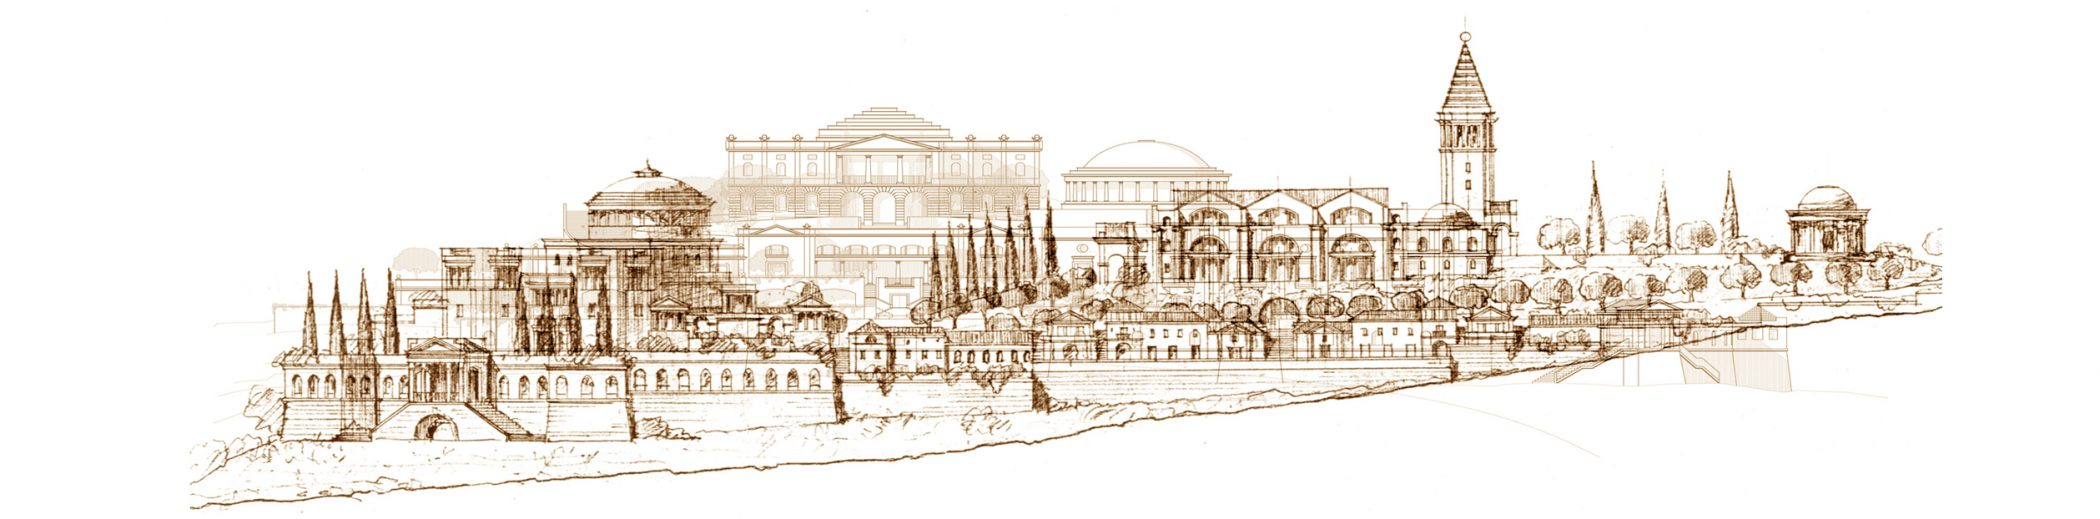 VII convocatoria del Premio Rafael Manzano de Nueva Arquitectura Tradicional